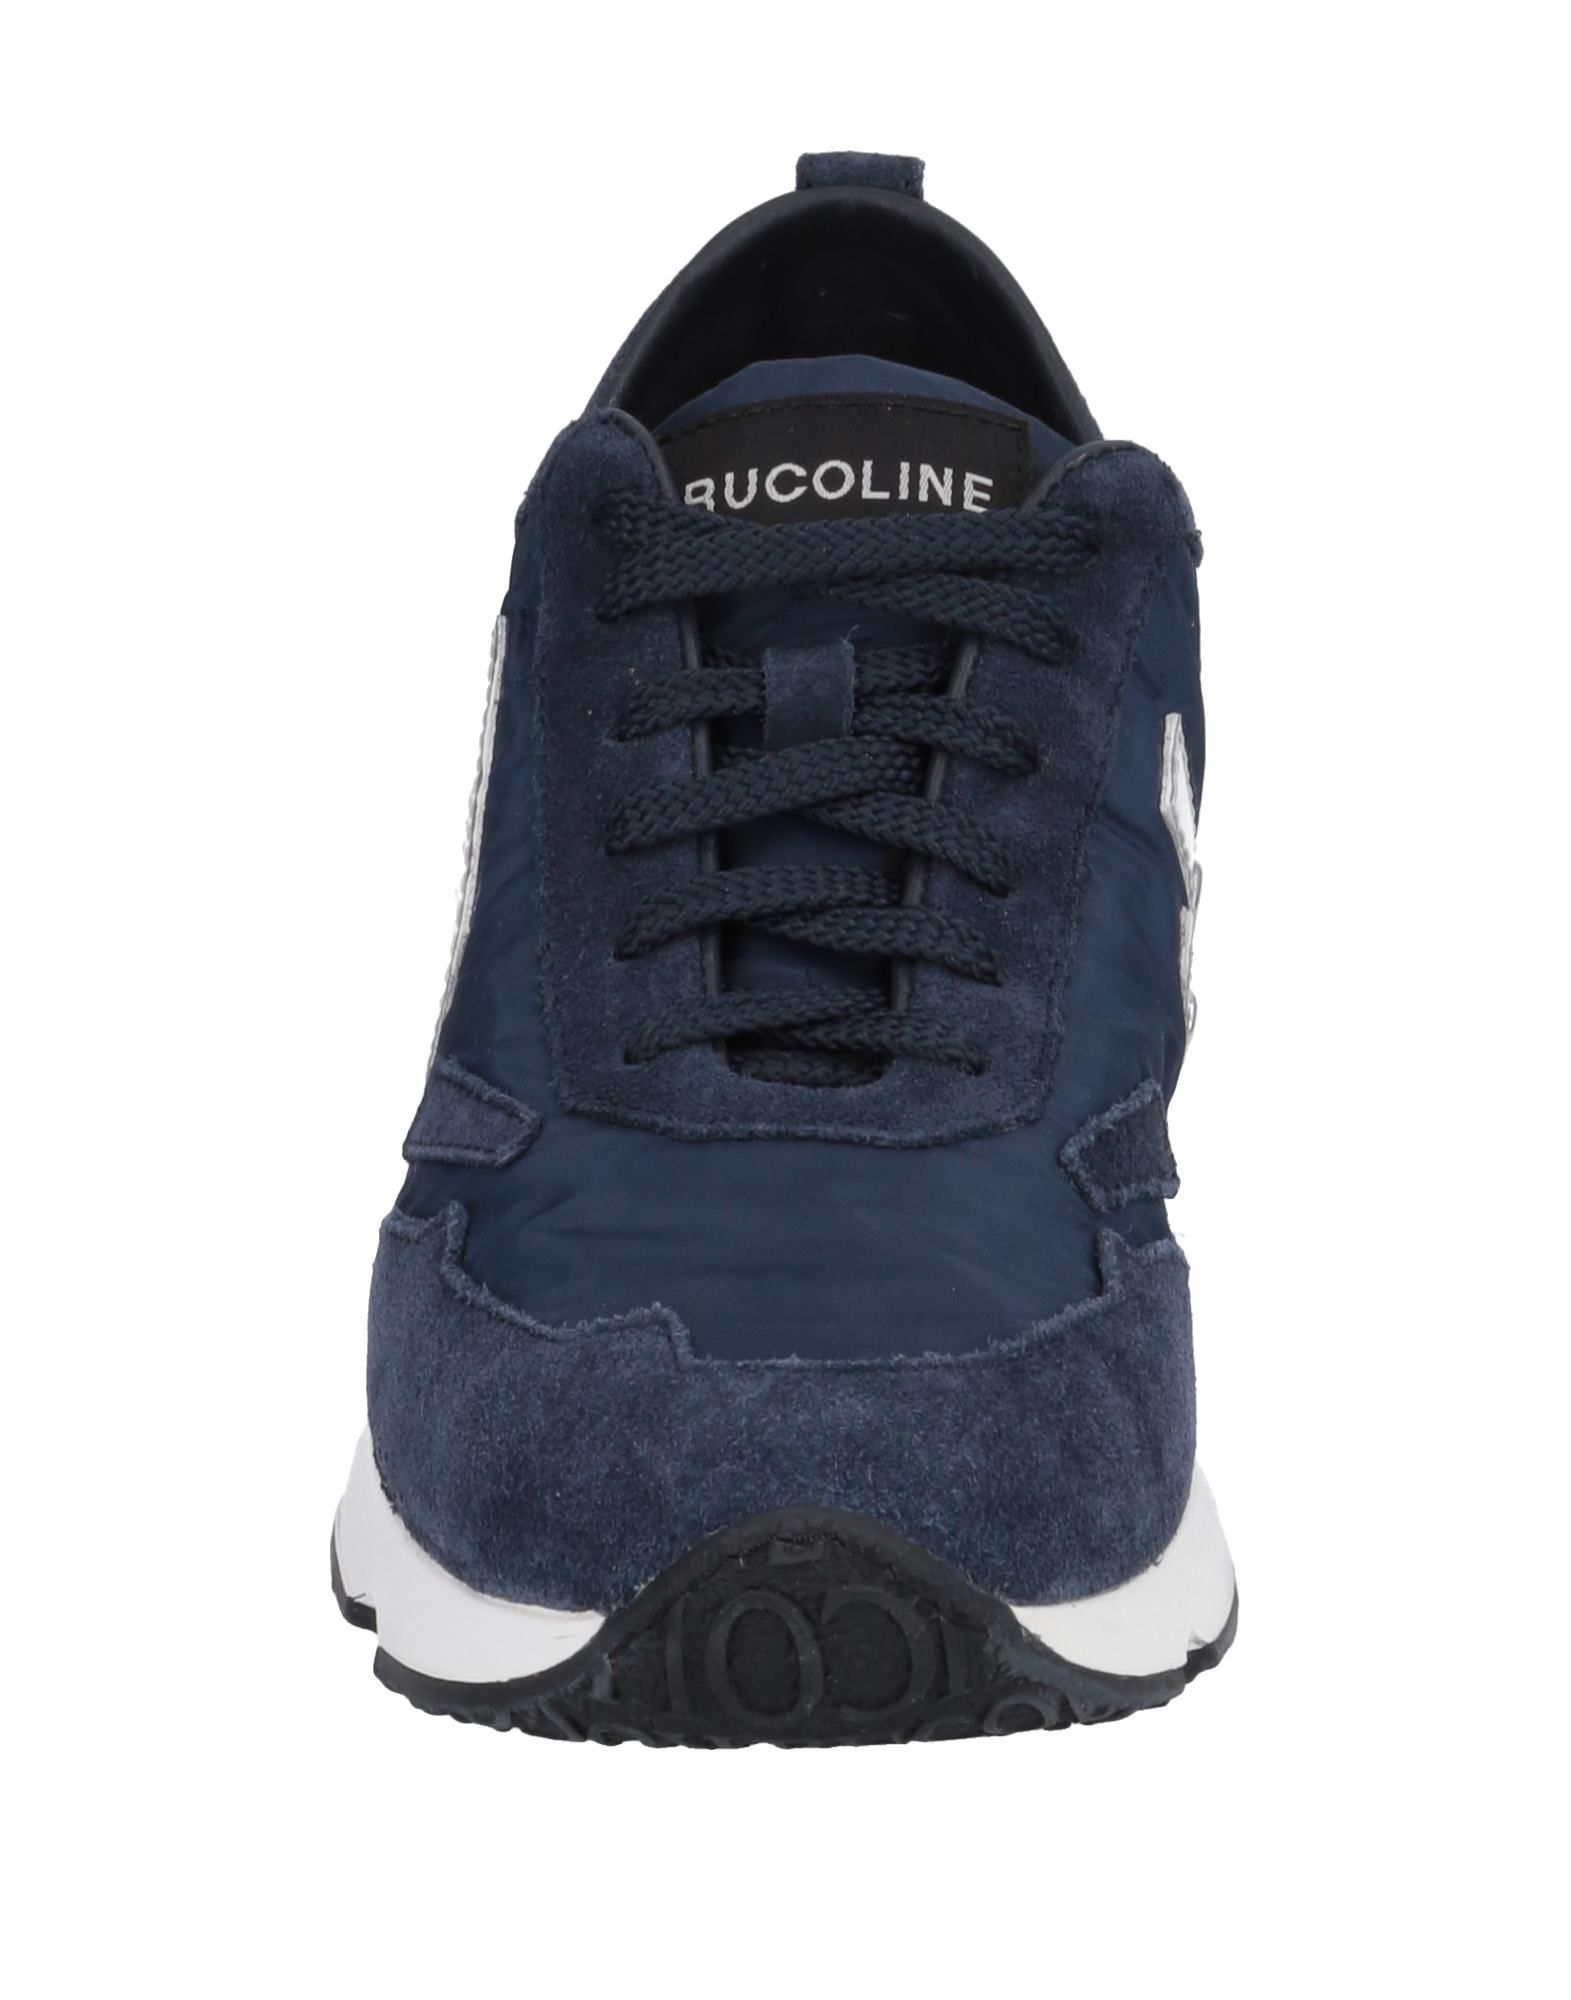 Gut um billige Damen Schuhe zu tragenRuco Line Sneakers Damen billige  11559435RK abcf41